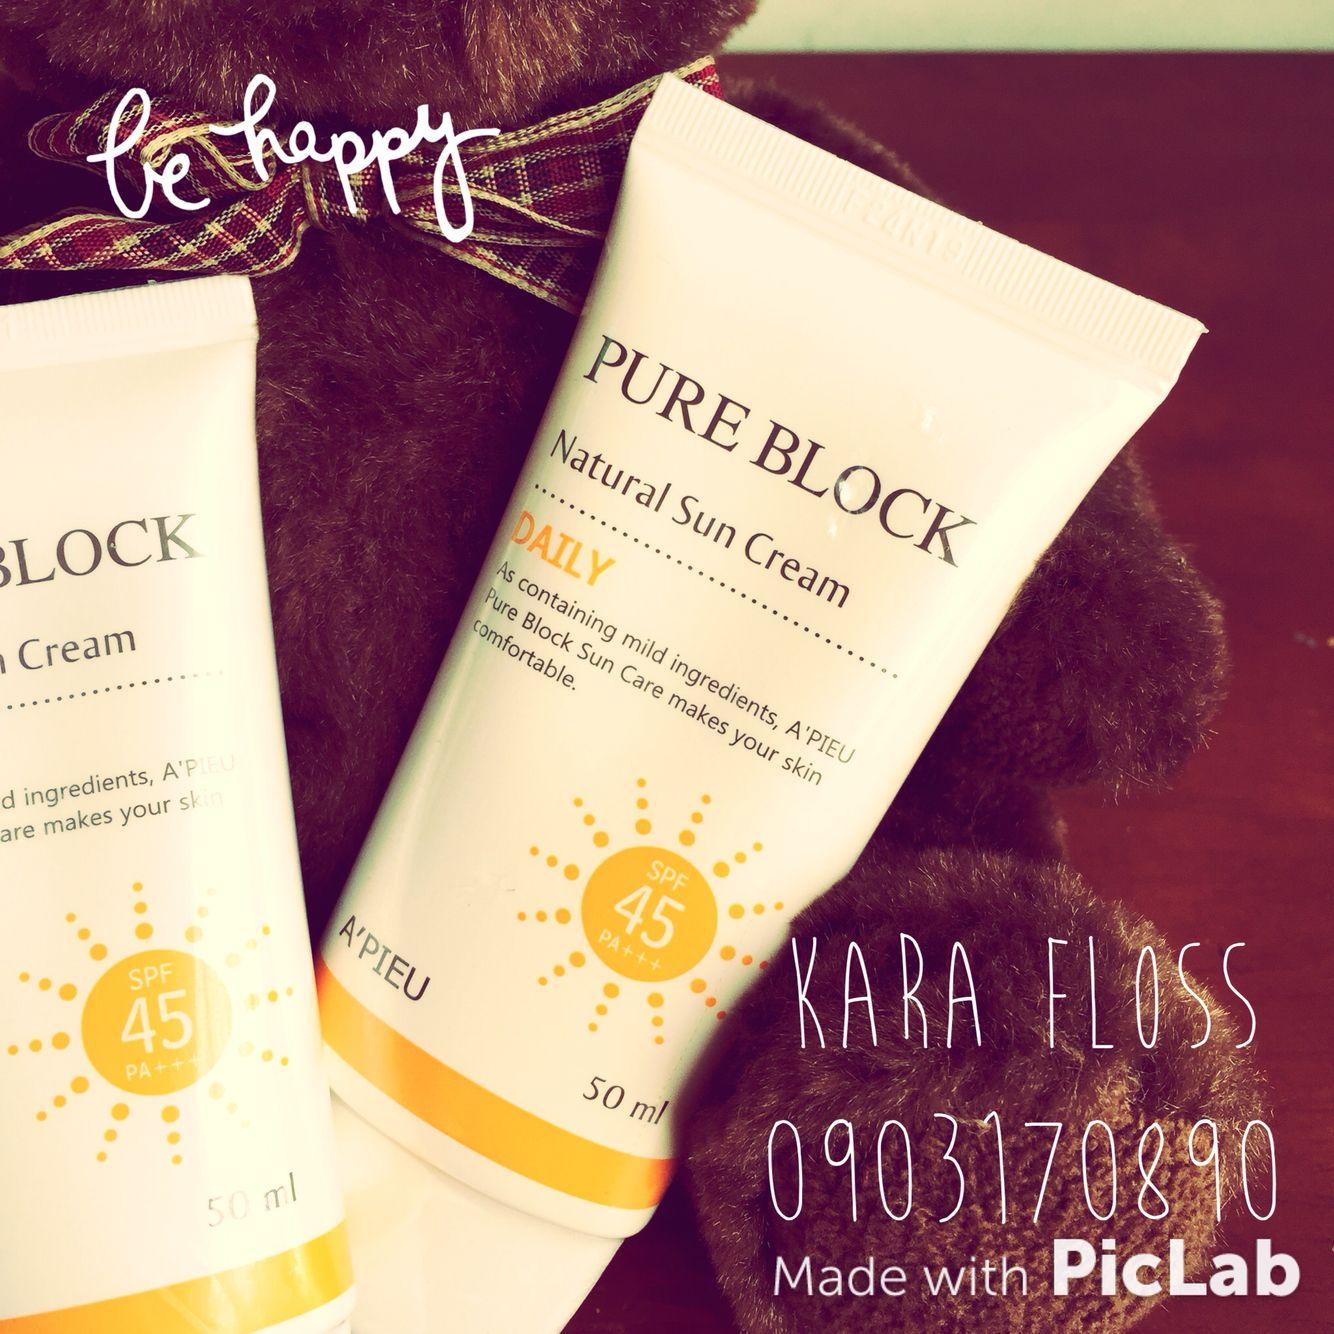 A Pieu Pure Block Natural Sun Cream Daily Spf45 Pa 50ml 170k